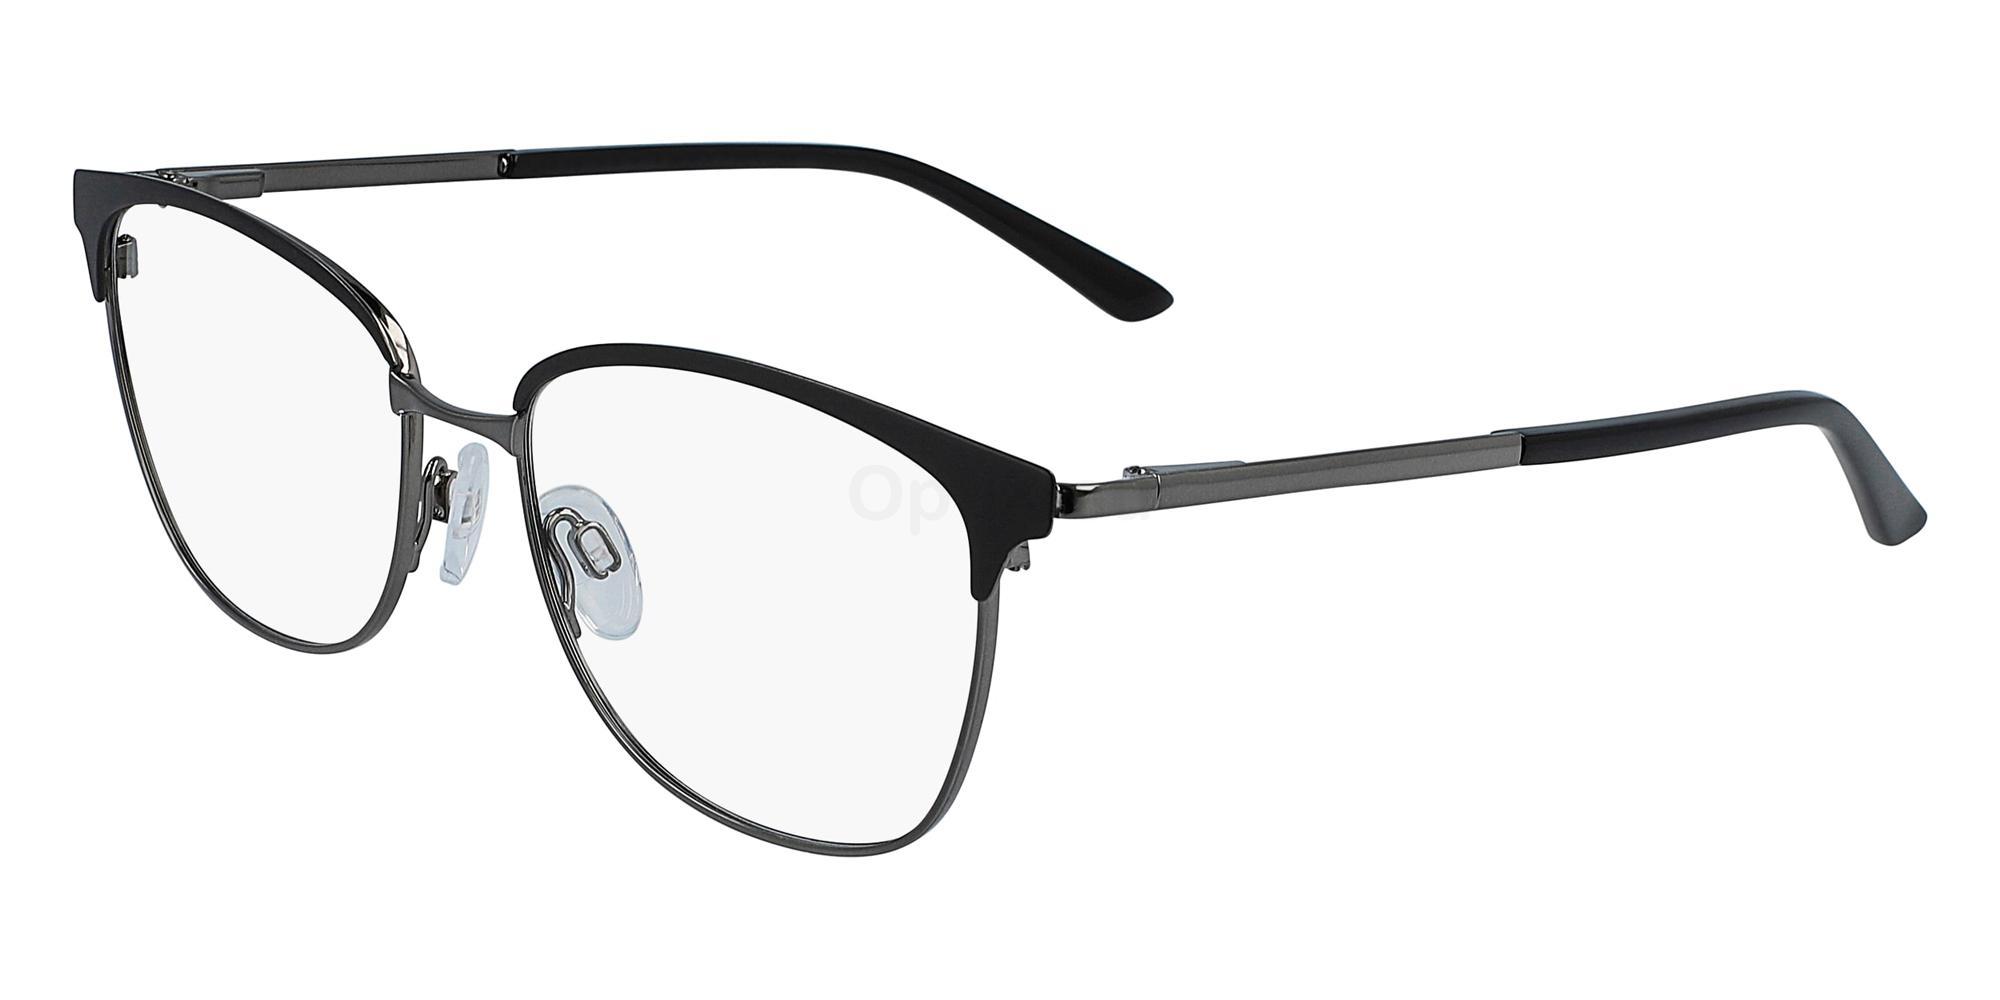 001 SK2842 LAGOM Glasses, Skaga